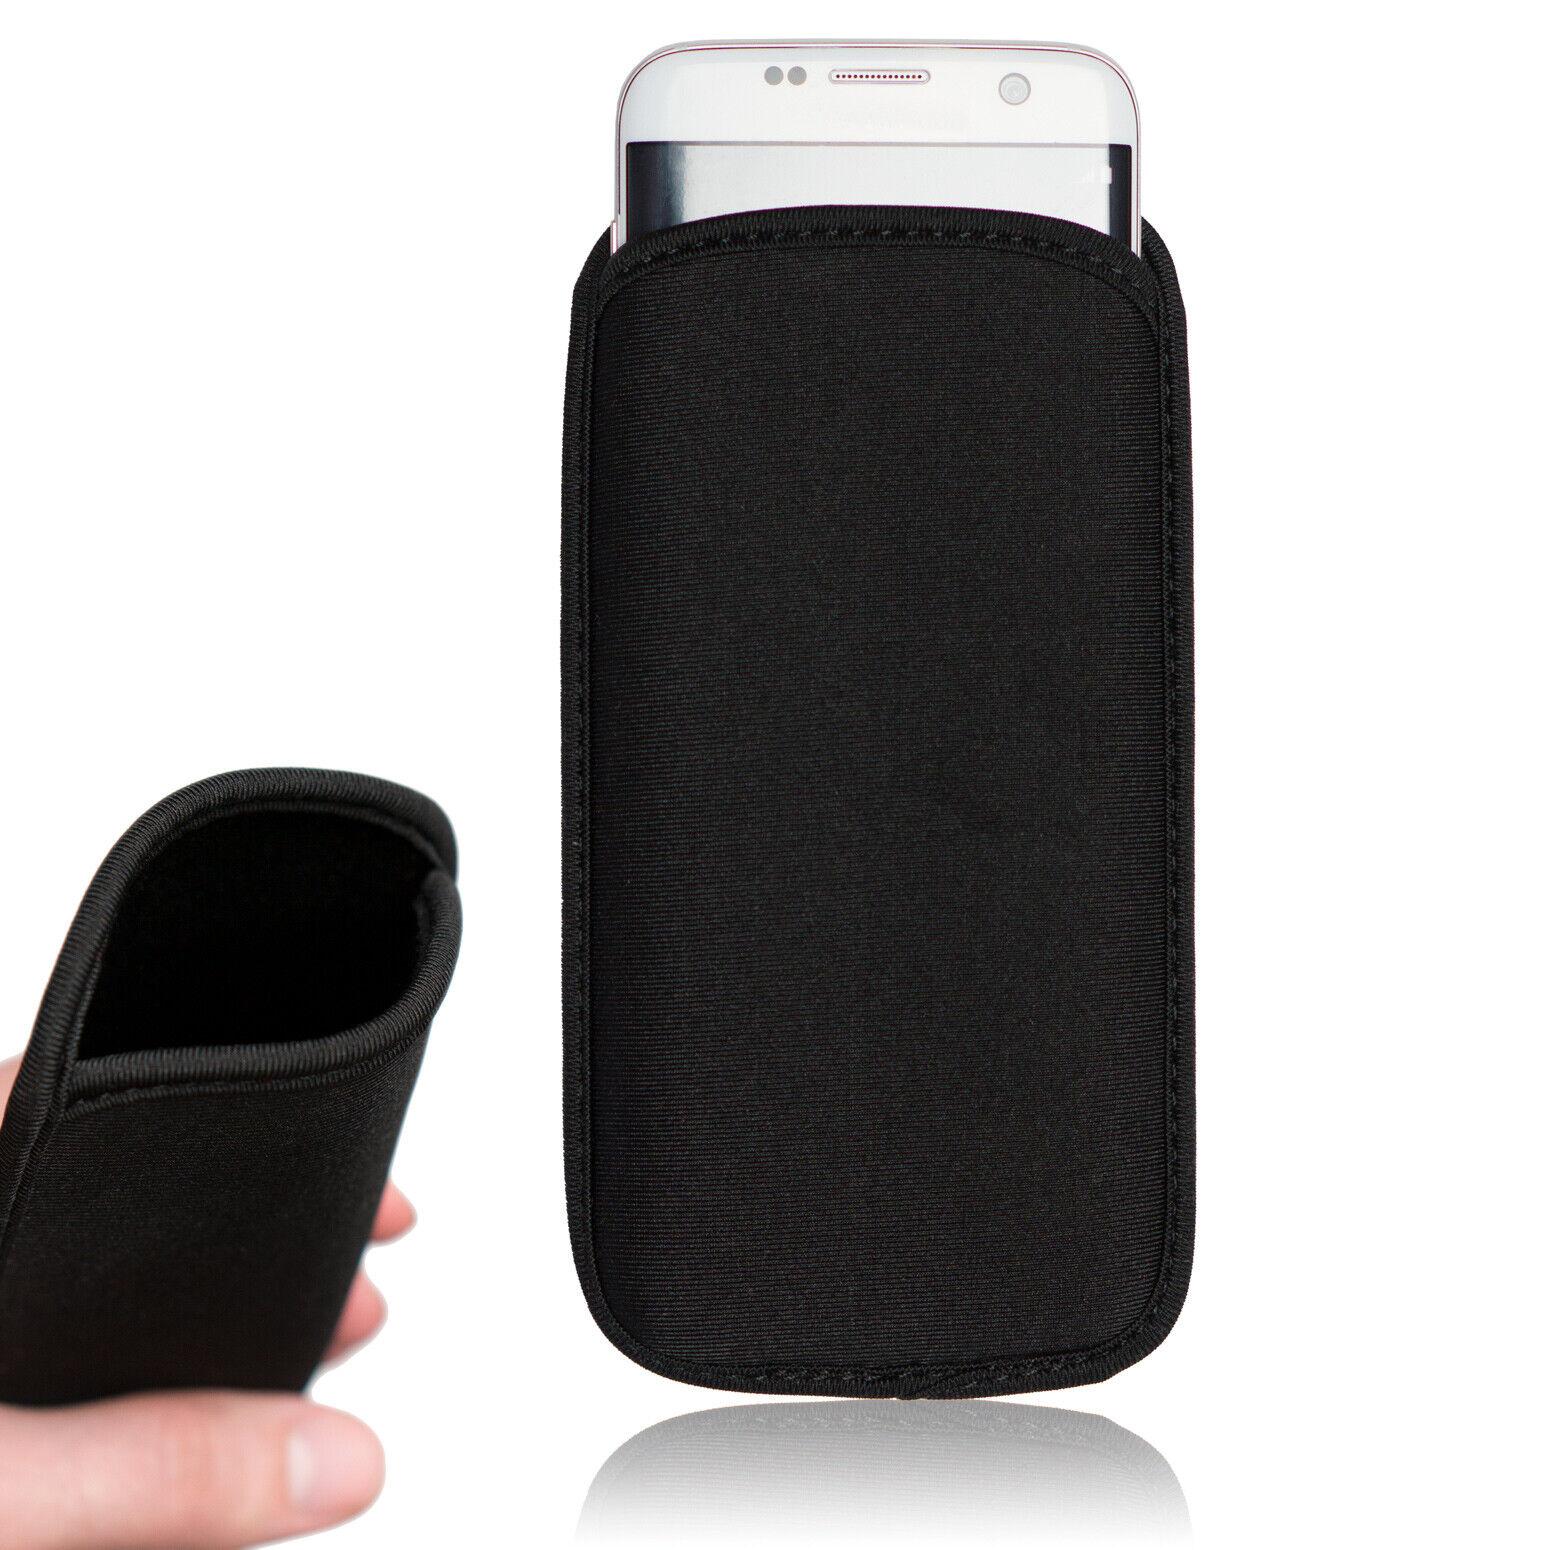 Neopren Handysocke Schutzhülle Handy Hülle Tasche Etui Case Cover Schale Etui